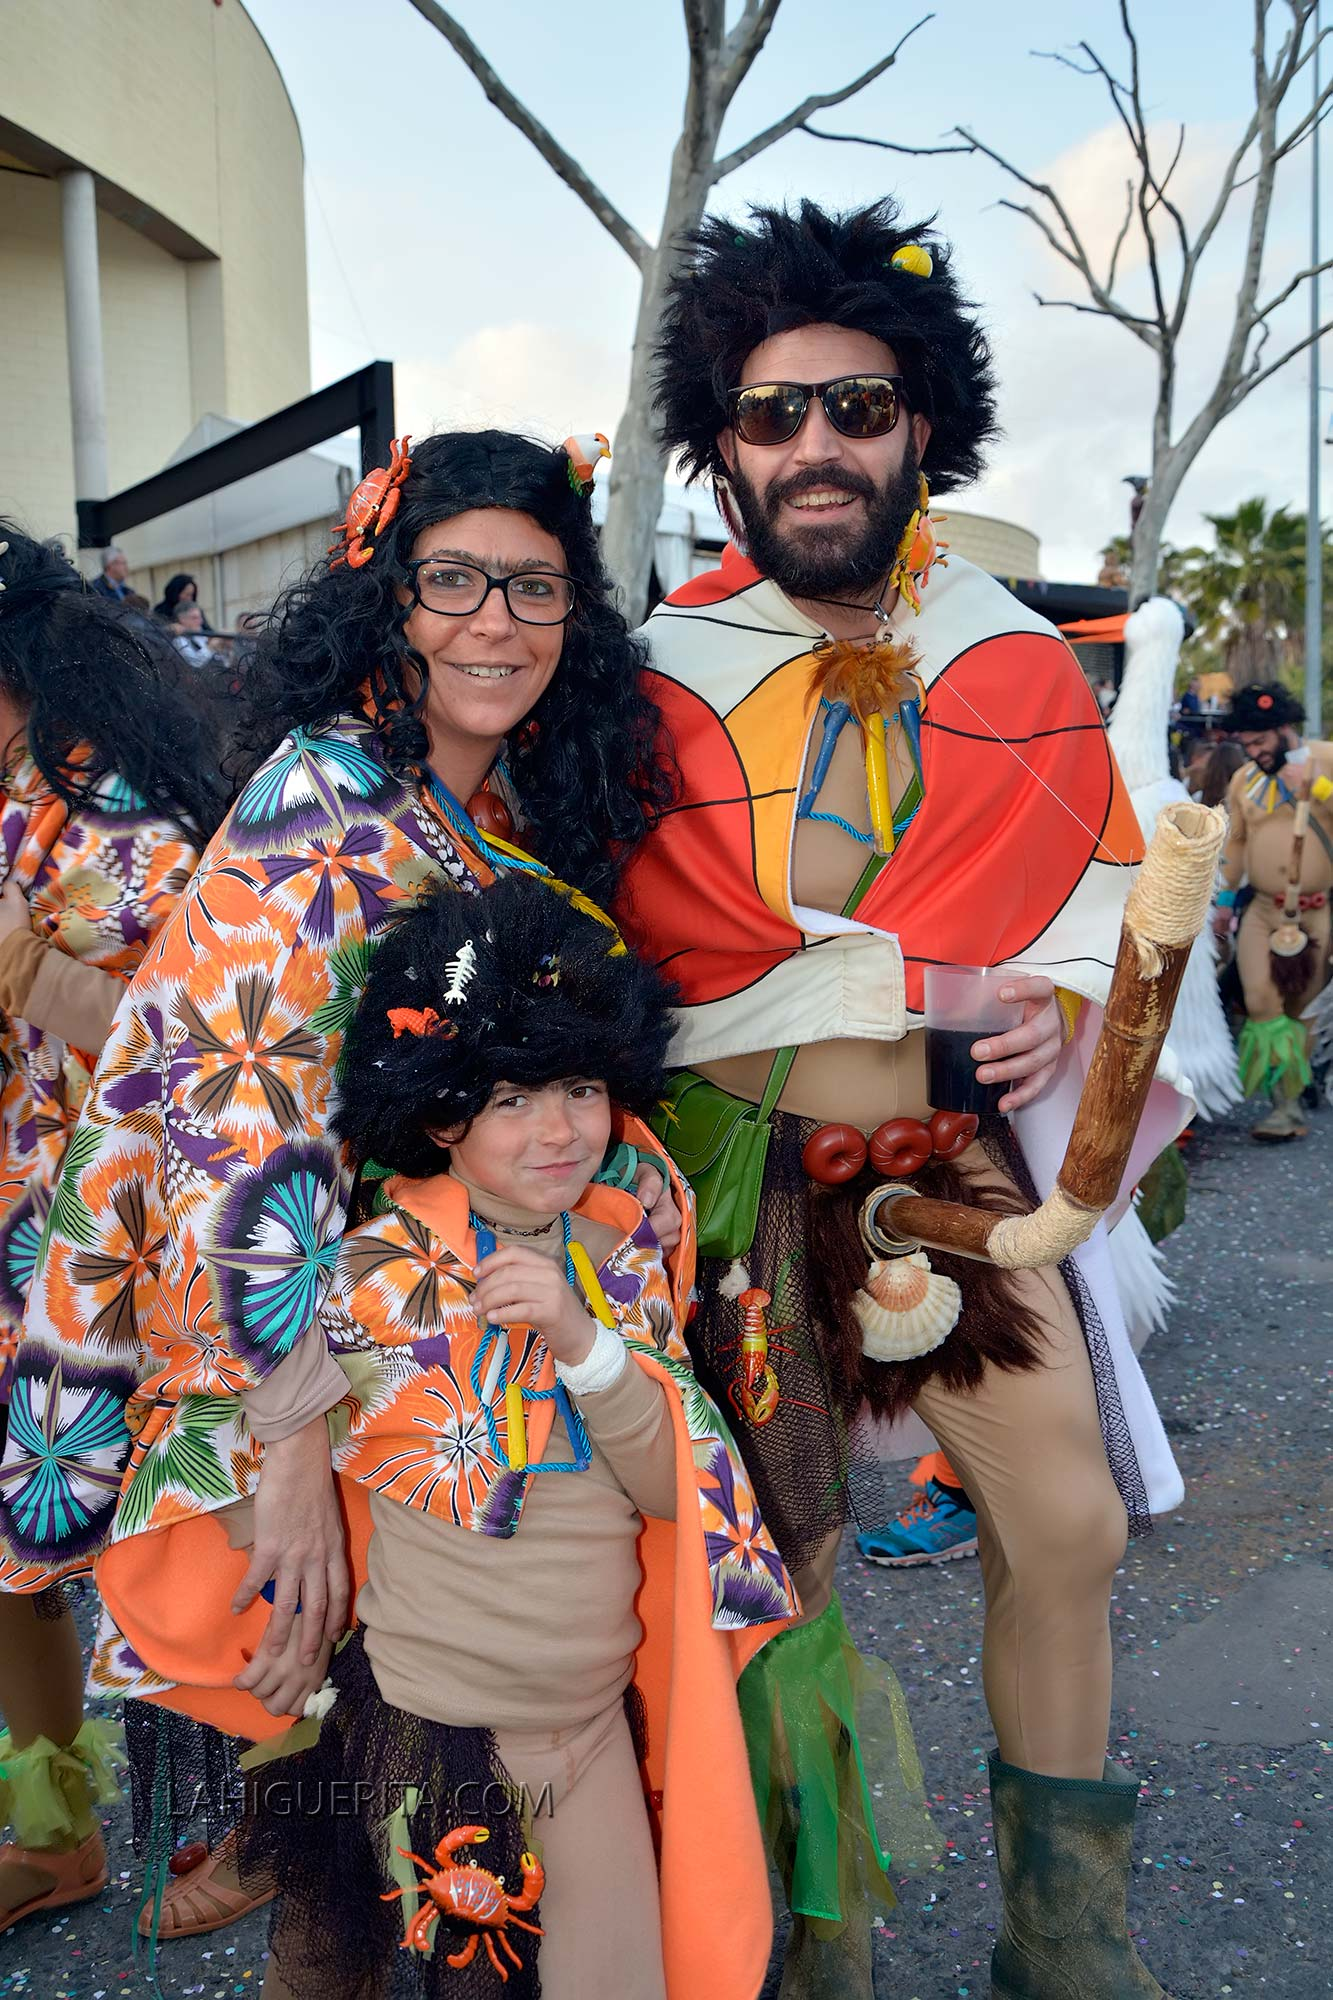 cabalgata carnaval isla cristina _DSC0995